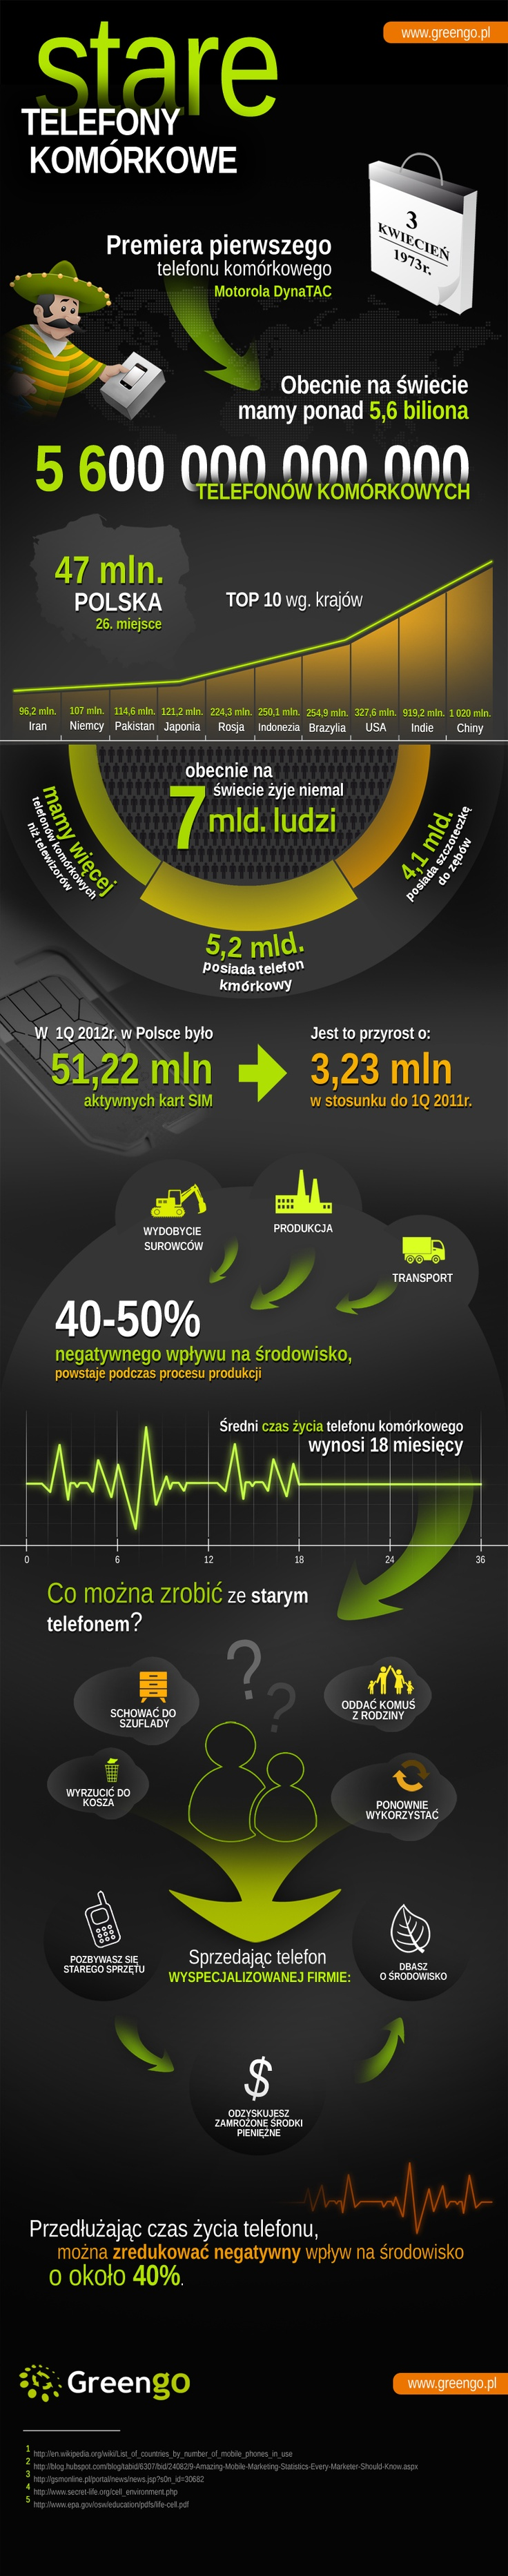 Stare telefony komórkowe (infografika) - infografika, komórka | media2.pl